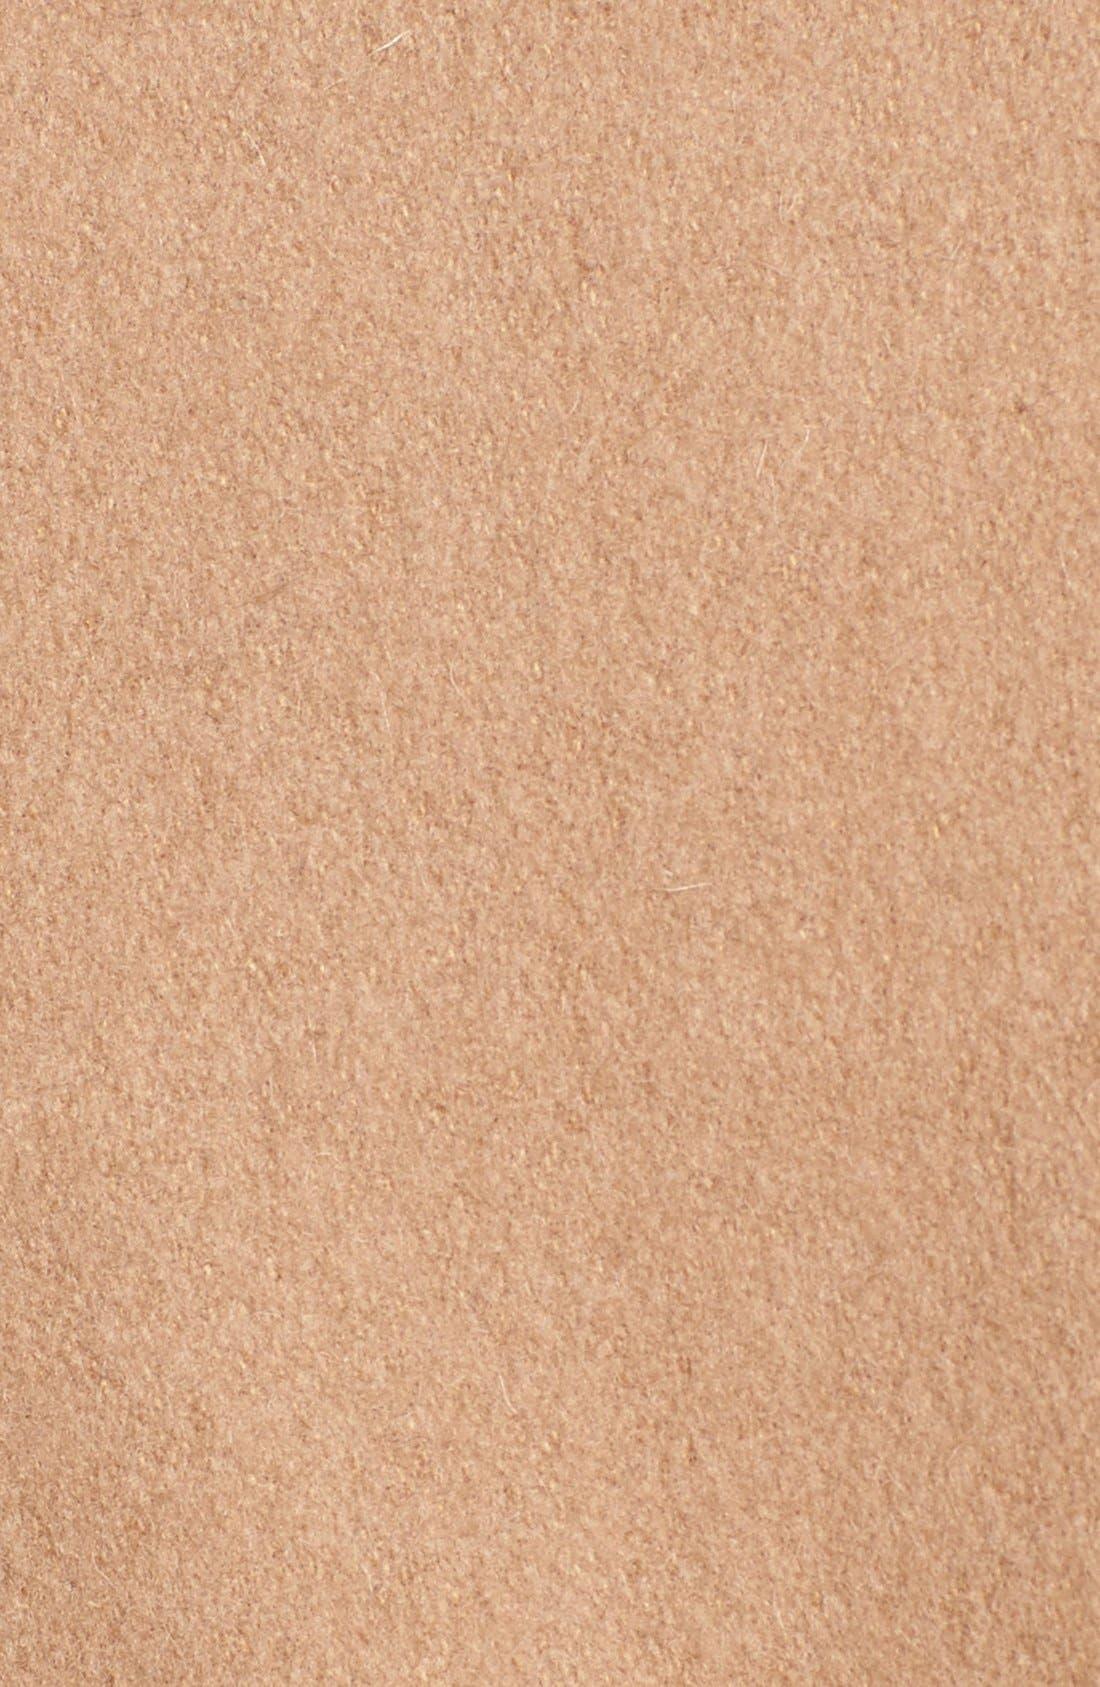 Alternate Image 3  - Via Spiga Faux Fur & Faux Leather Trim Asymmetrical Belted Coat (Online Only)